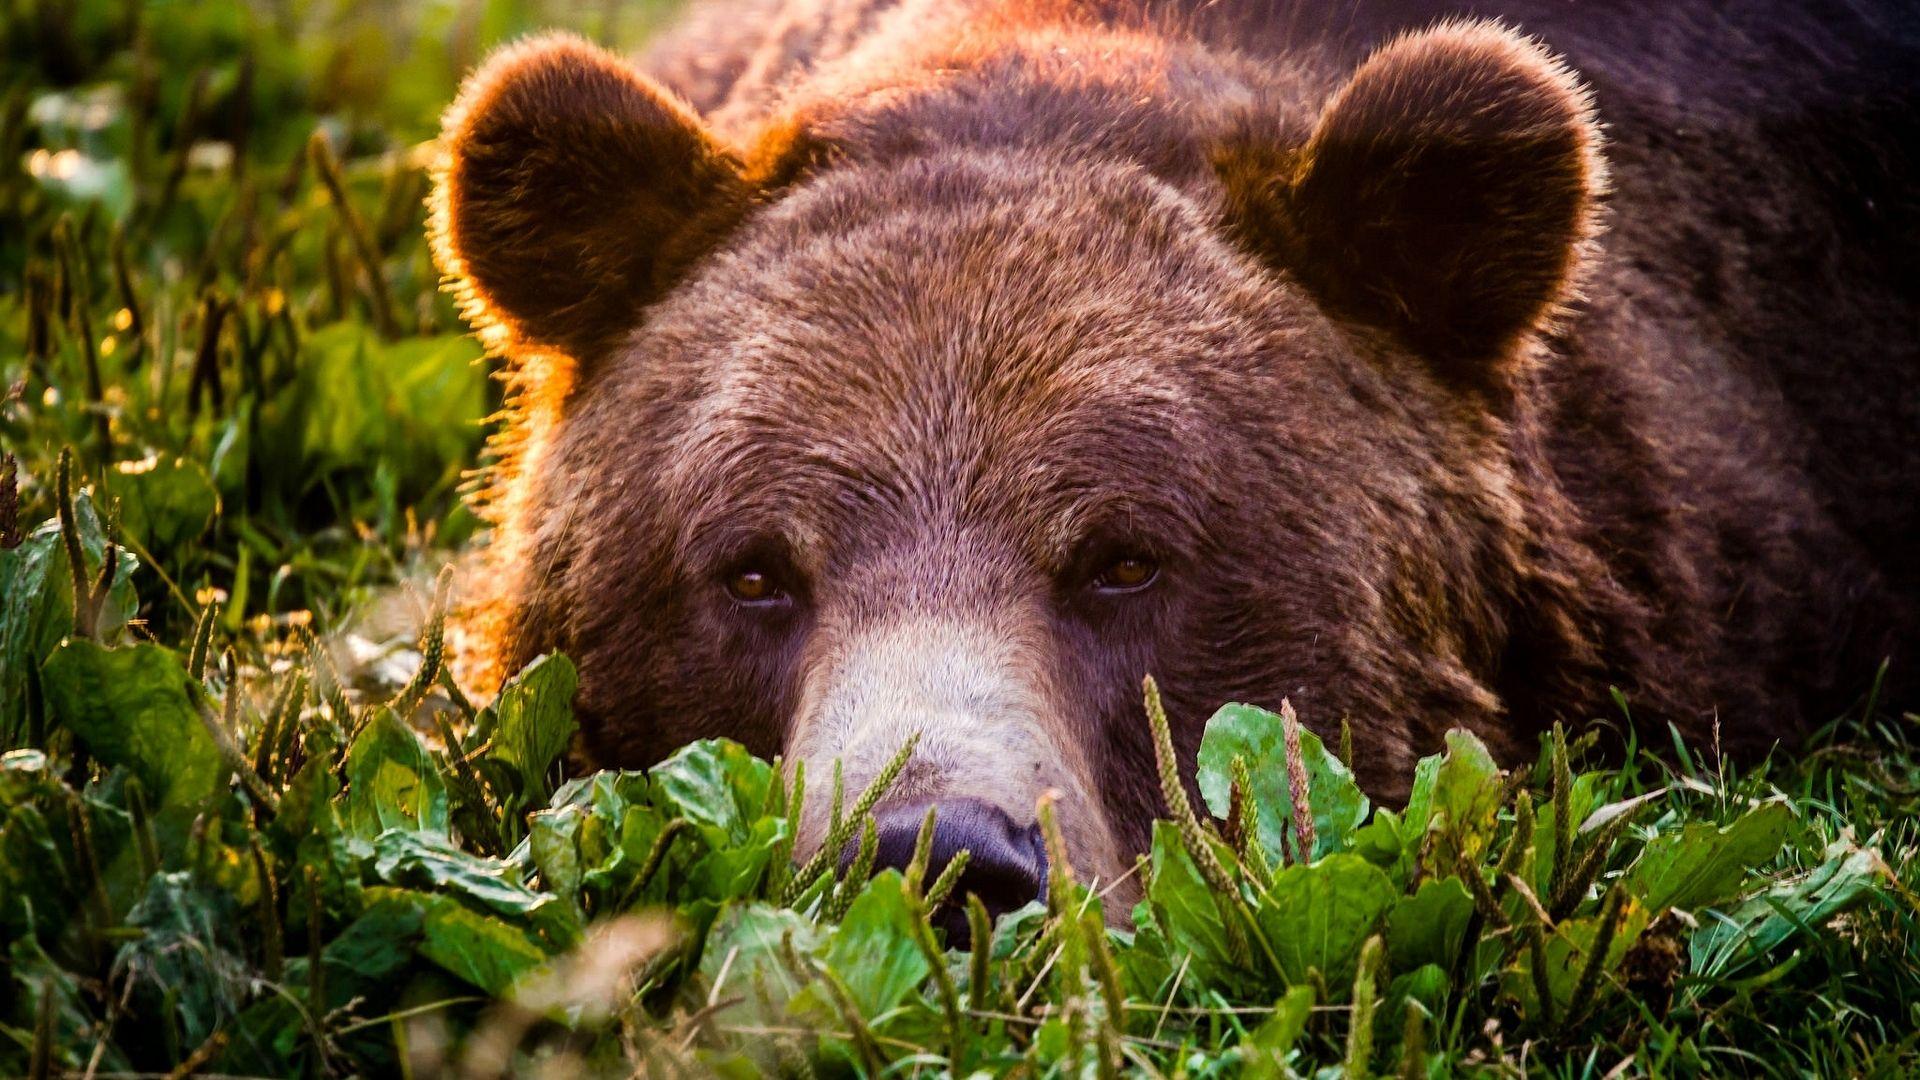 The Bear Eats The Berries Photo